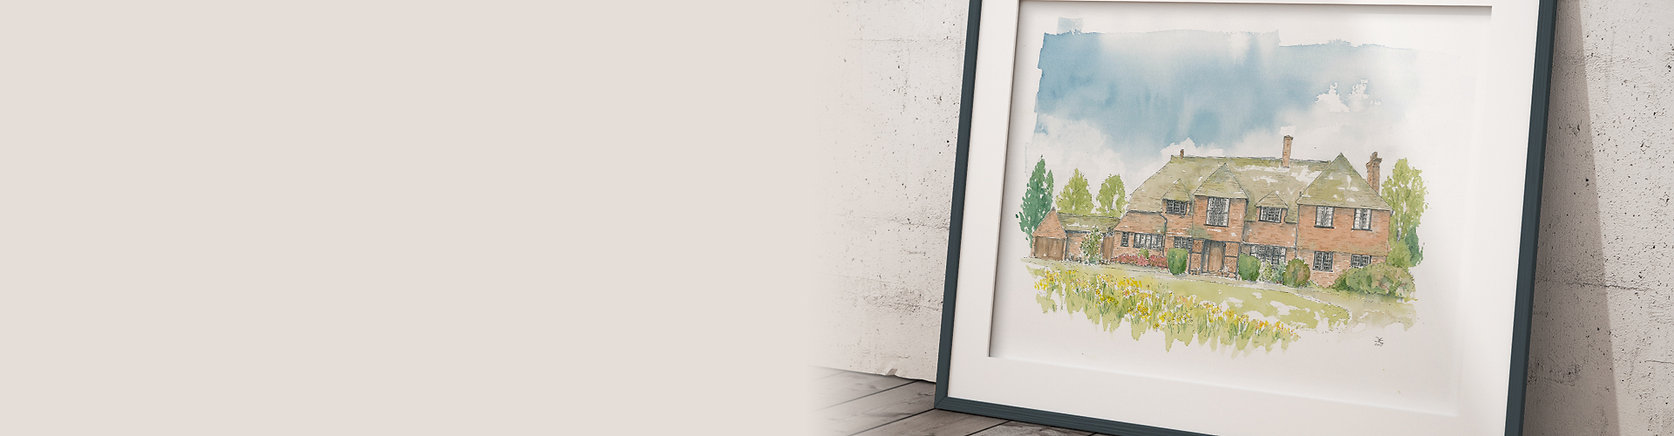 order custom print of your house